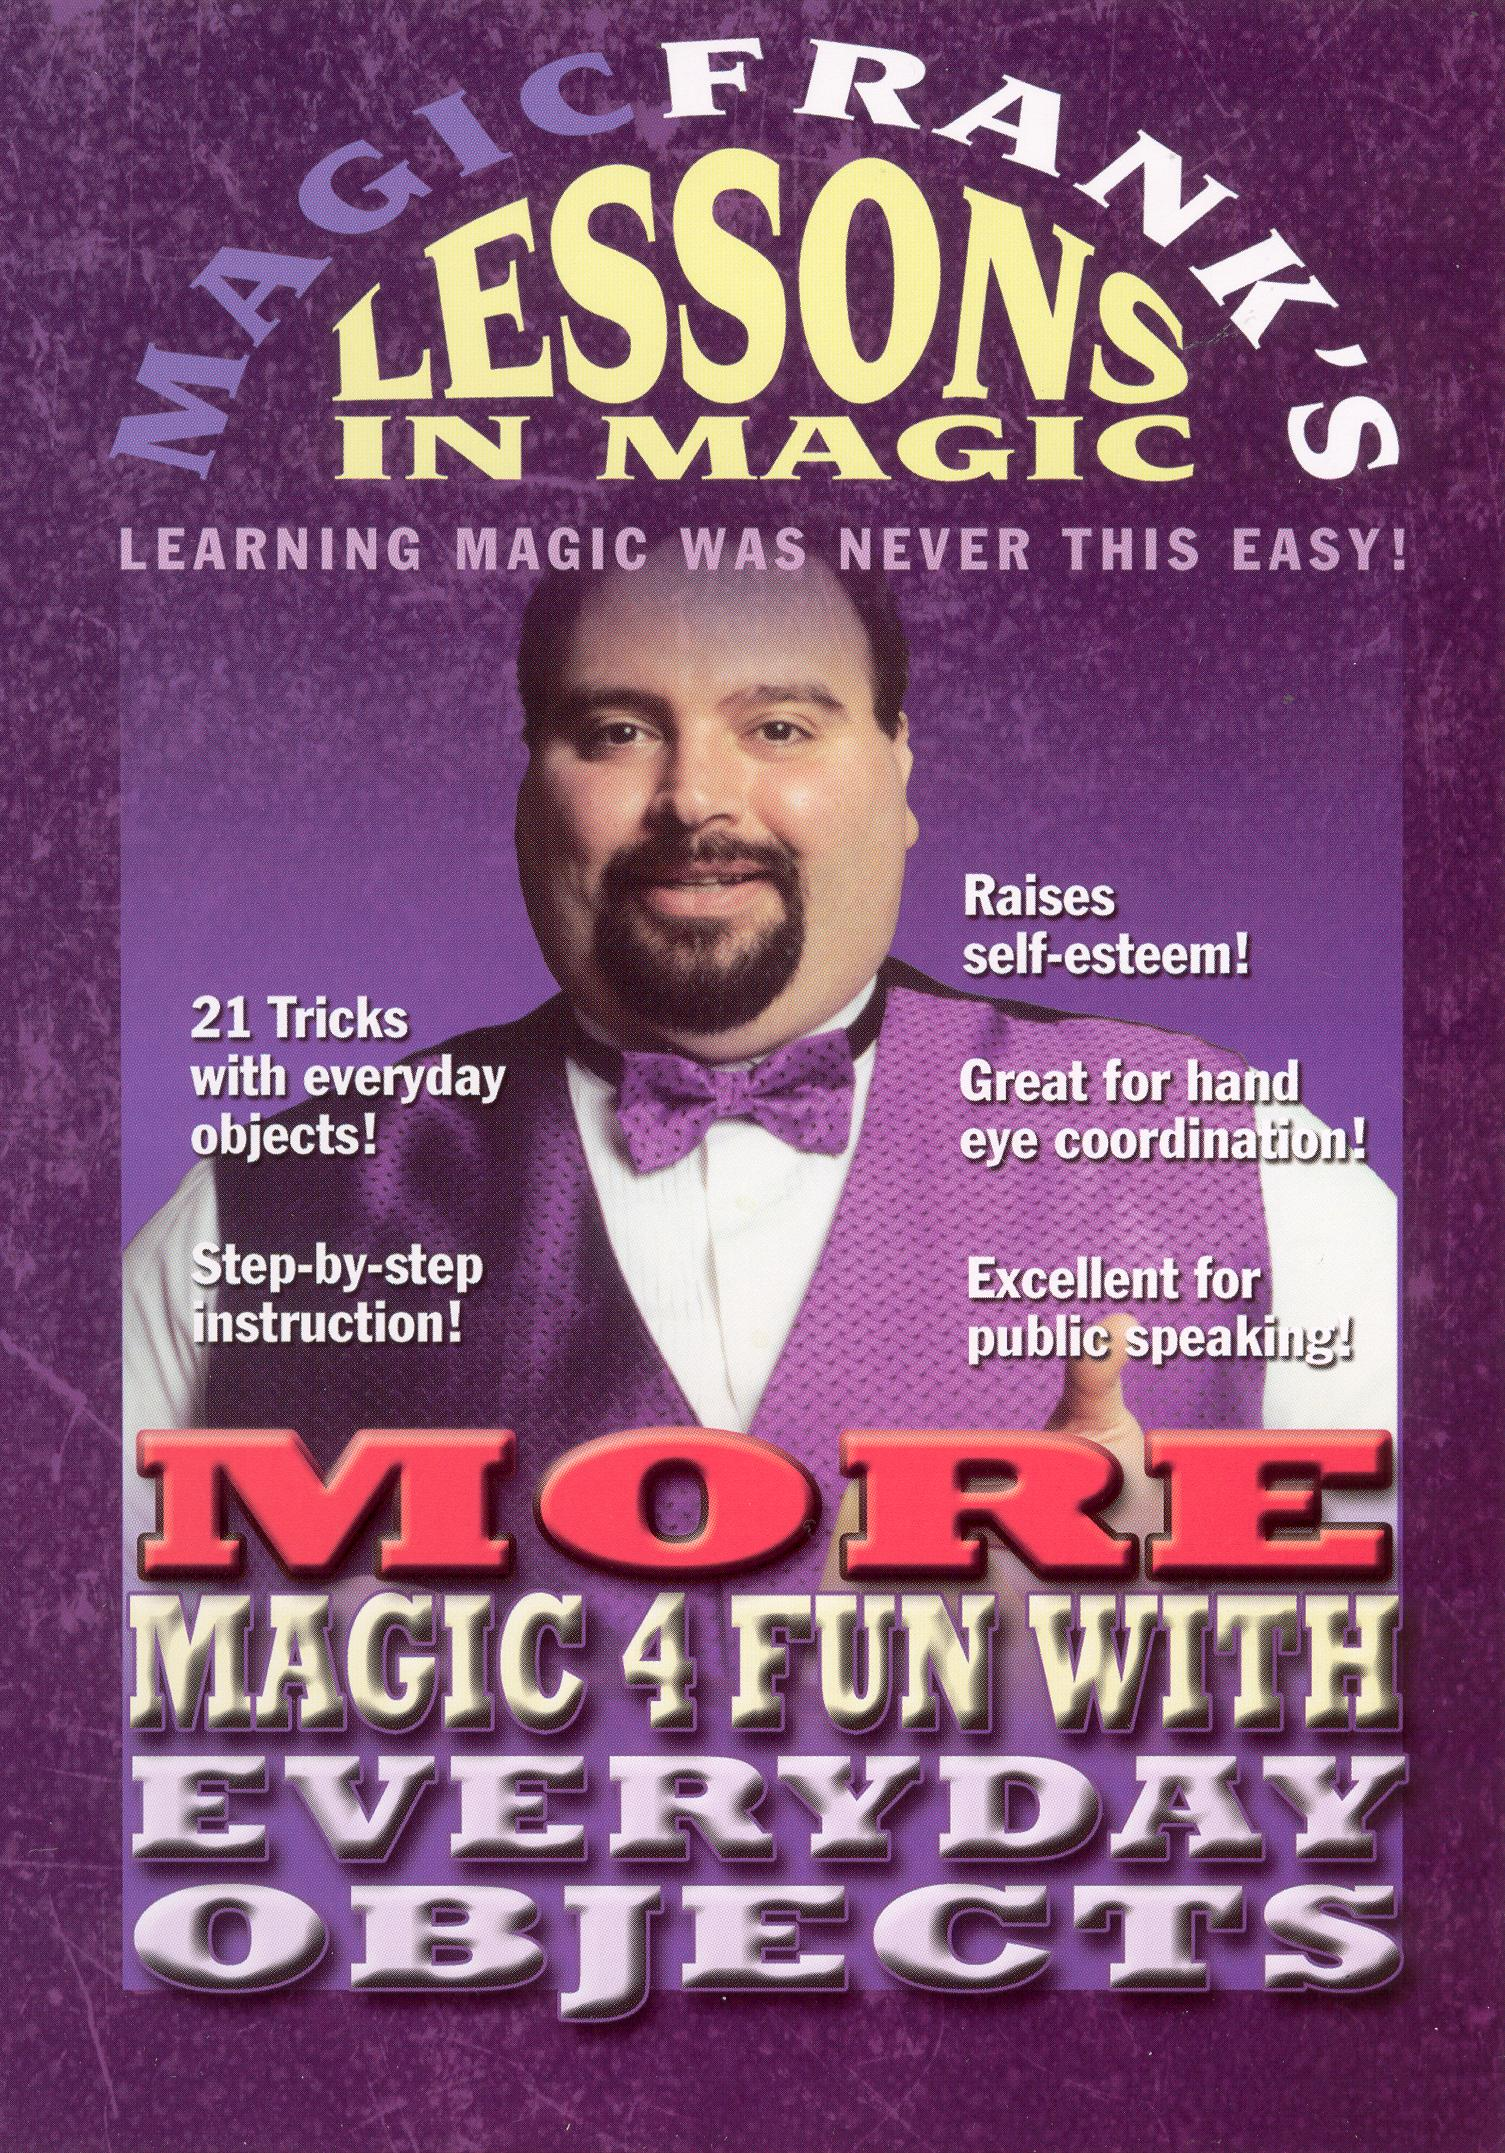 MAGICFRANK's Lessons in Magic: More Magic 4 Fun